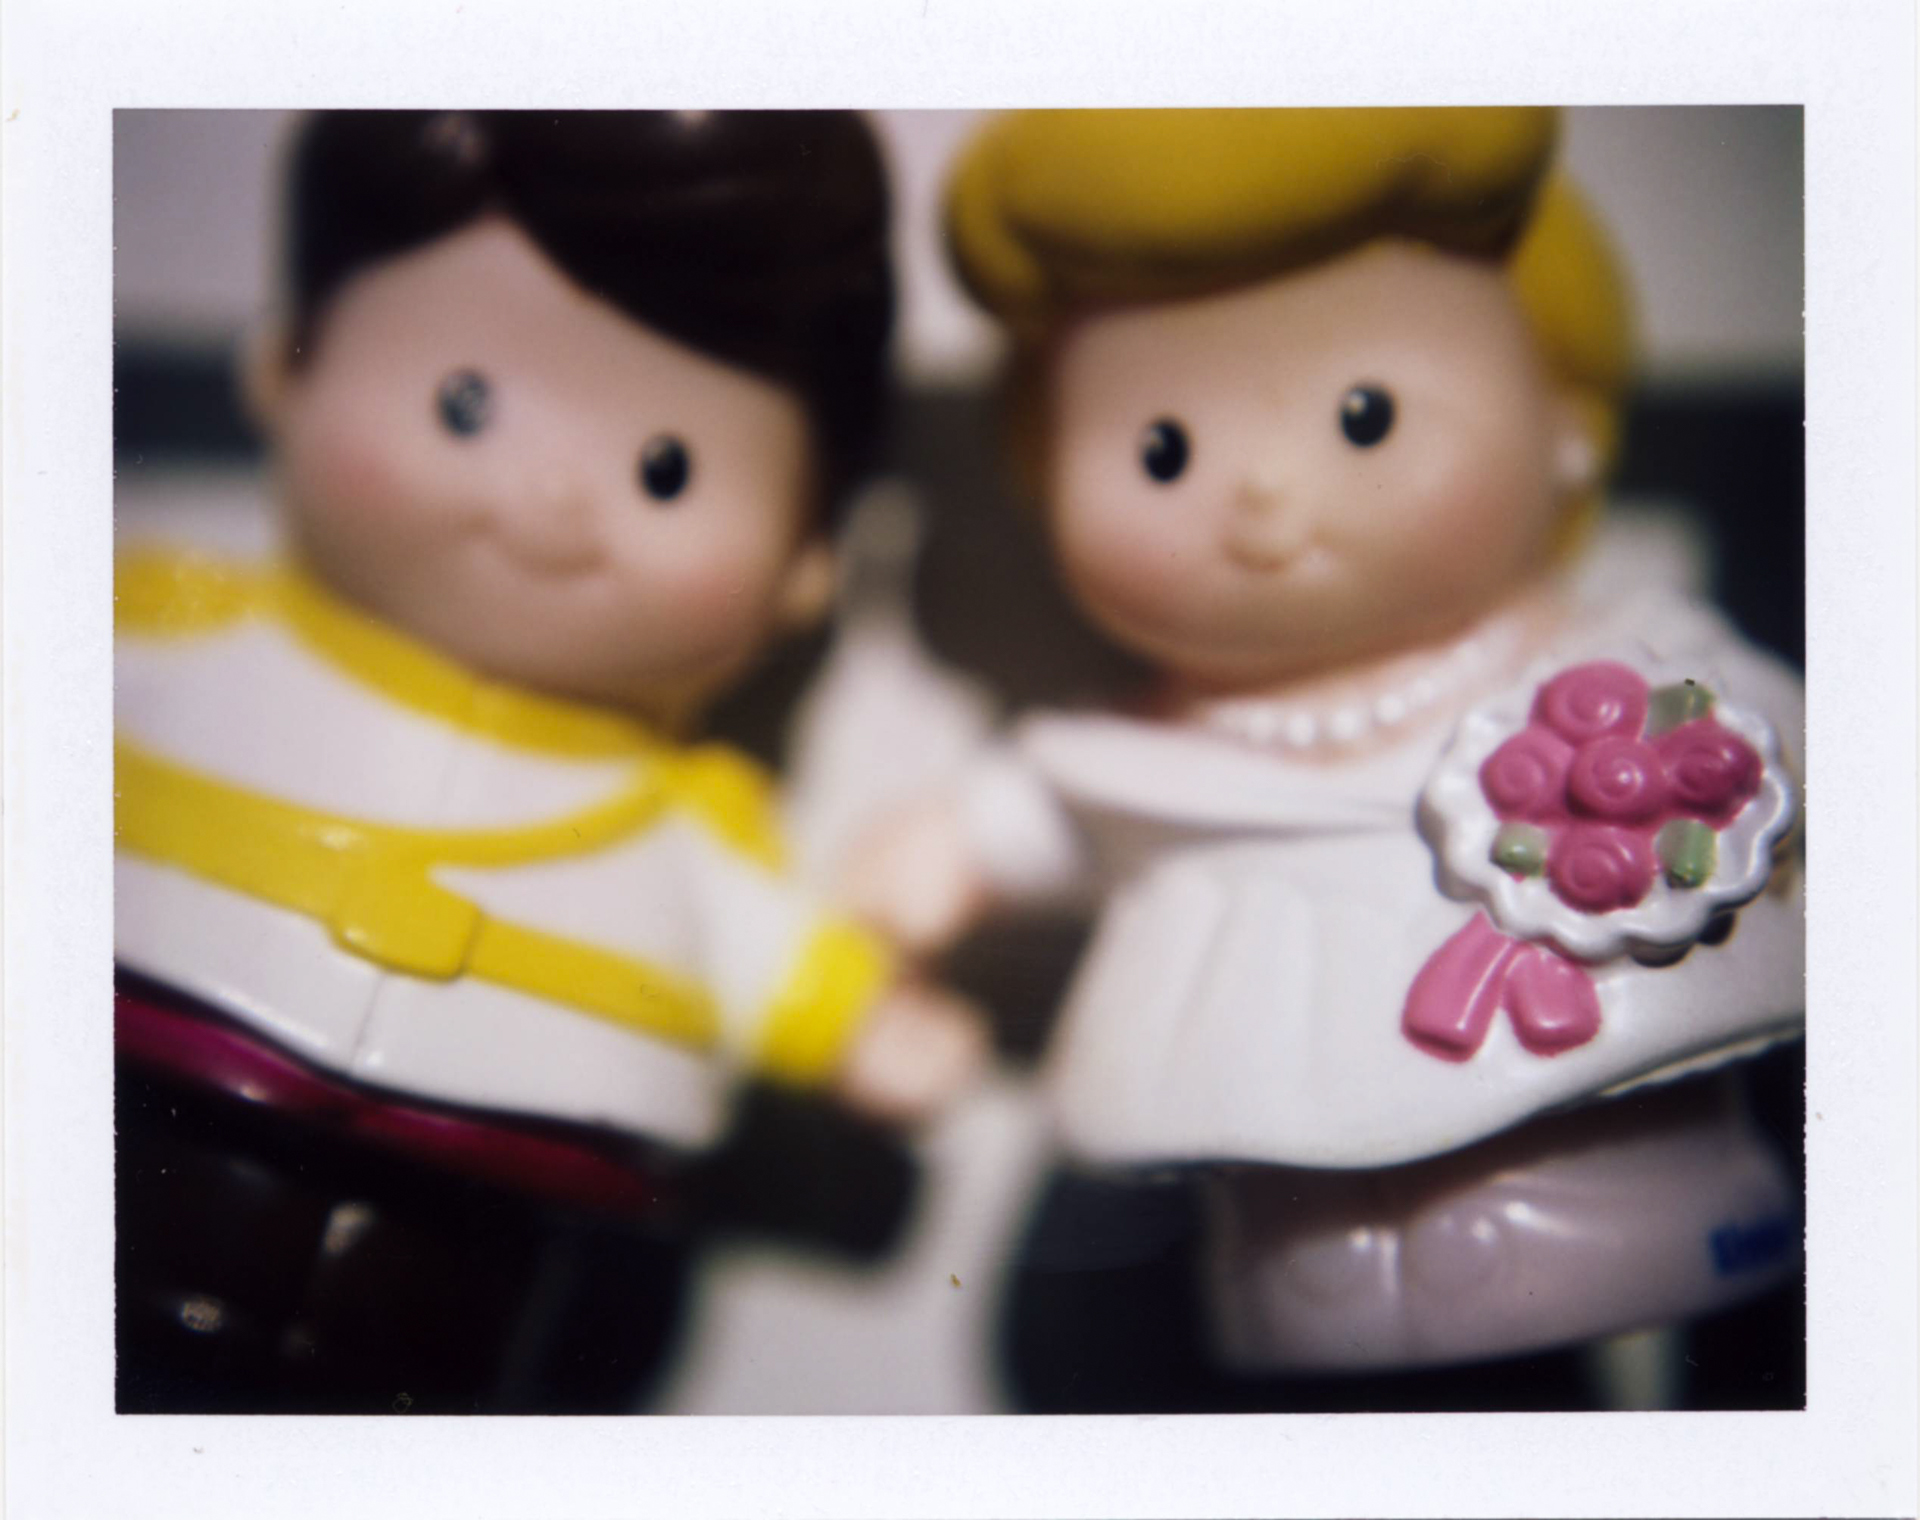 70 Happily Married Little People.jpg